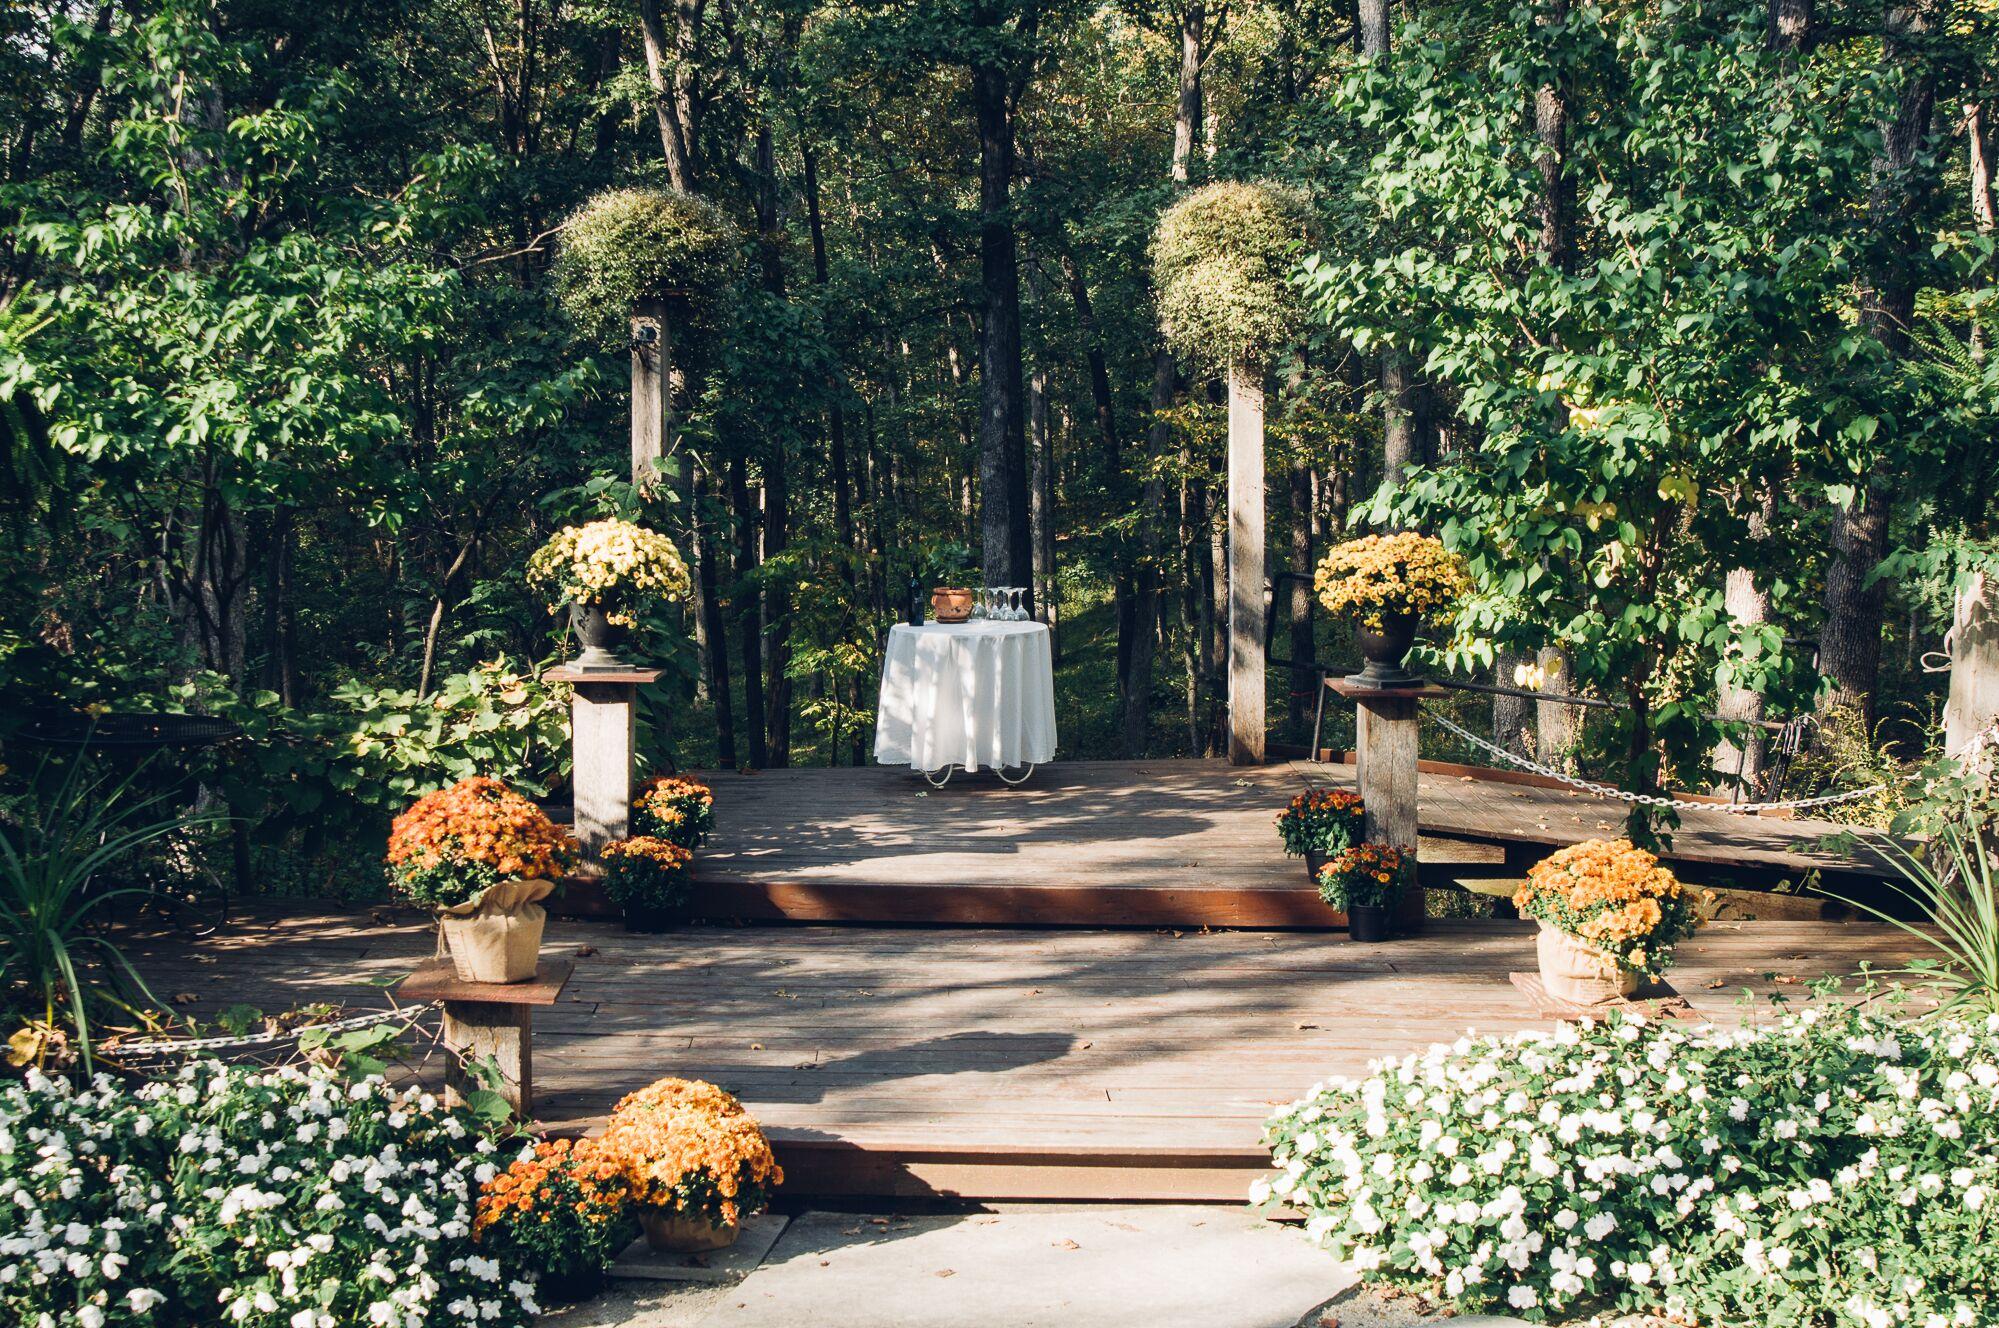 alpine park and gardens outdoor ceremony venue